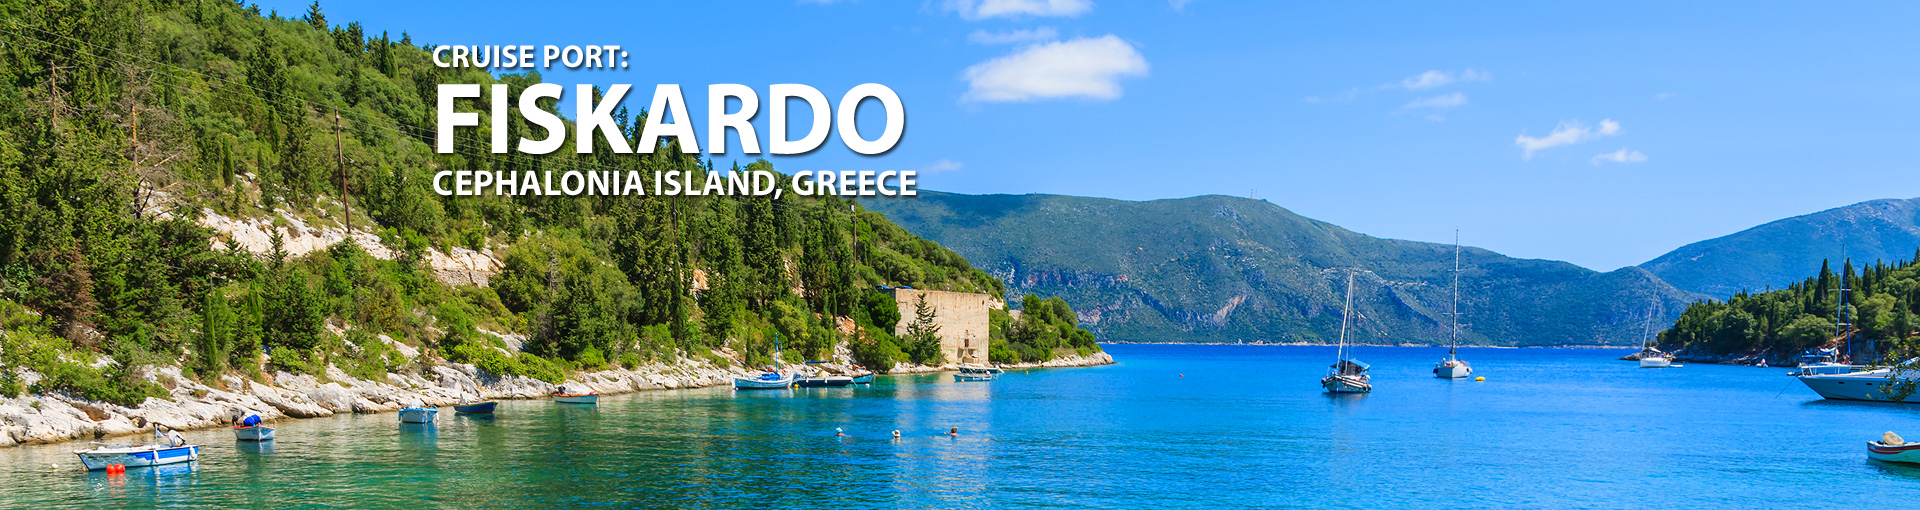 Cruises to Fiskardo, Cephalonia Island